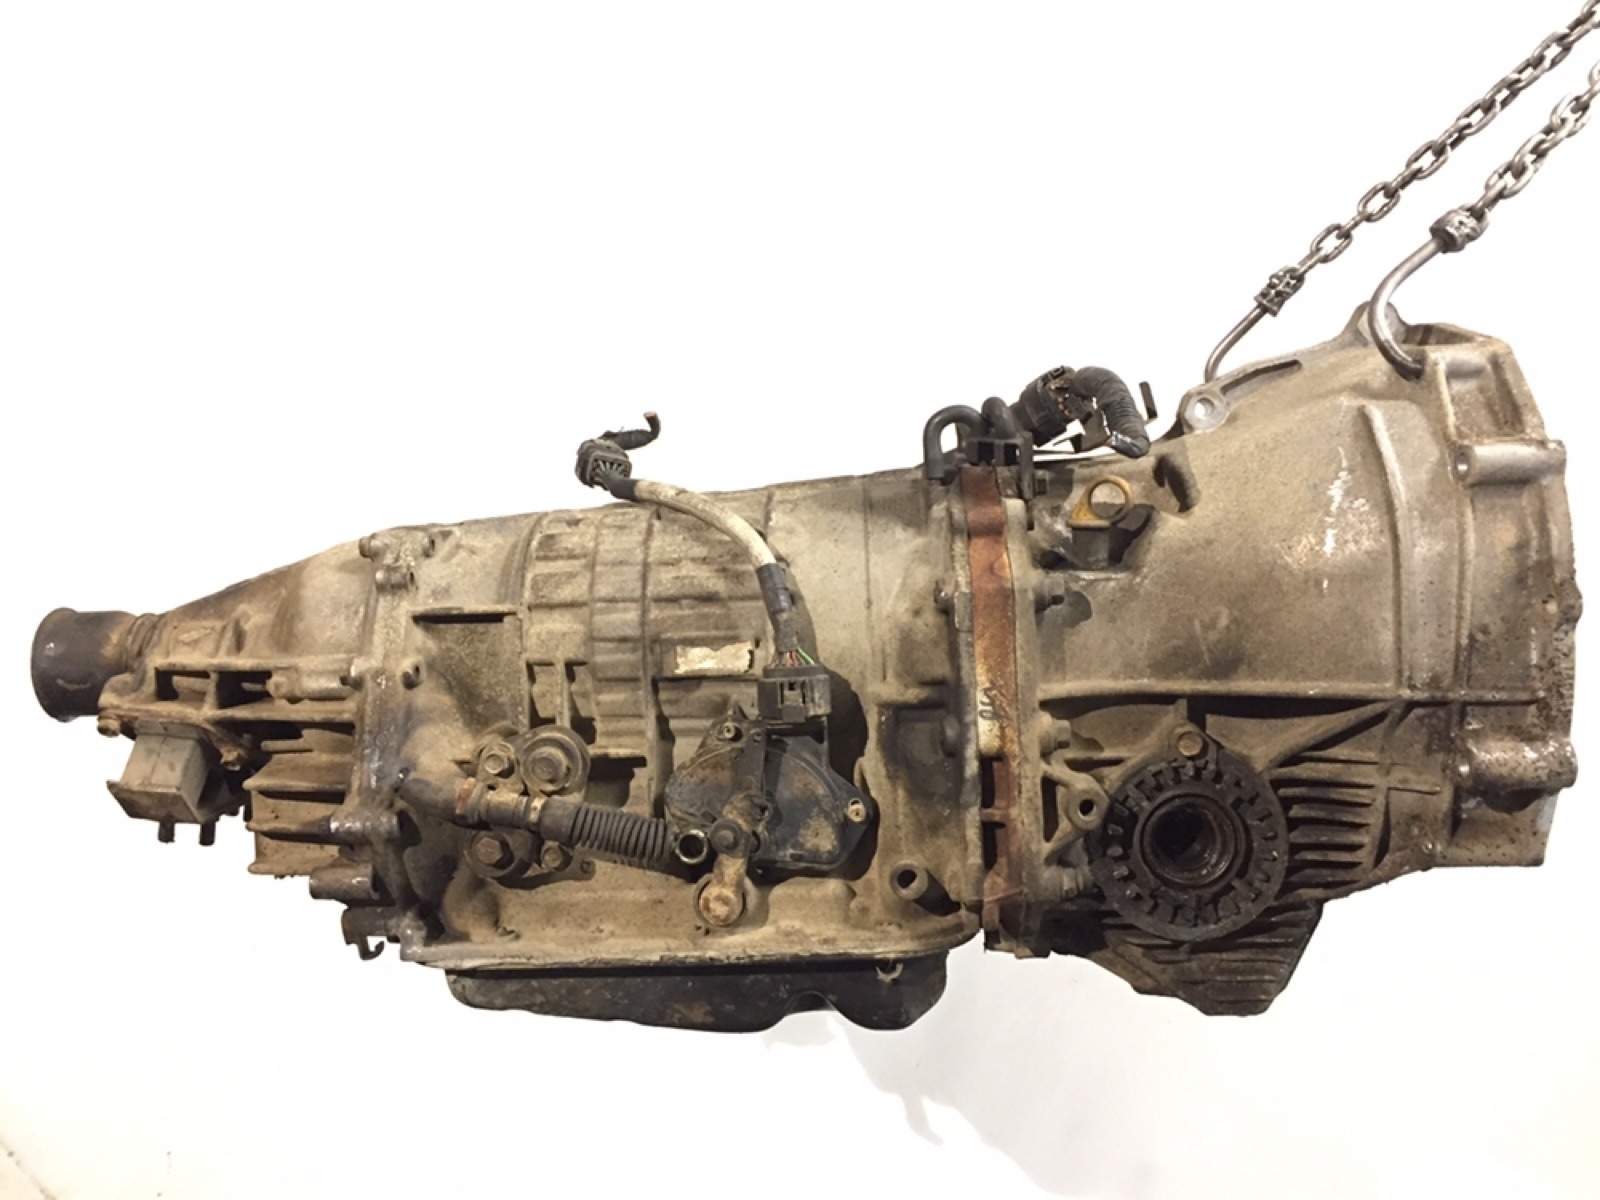 Кпп автоматическая (акпп) Subaru Forester 2.0 I 2000 (б/у)